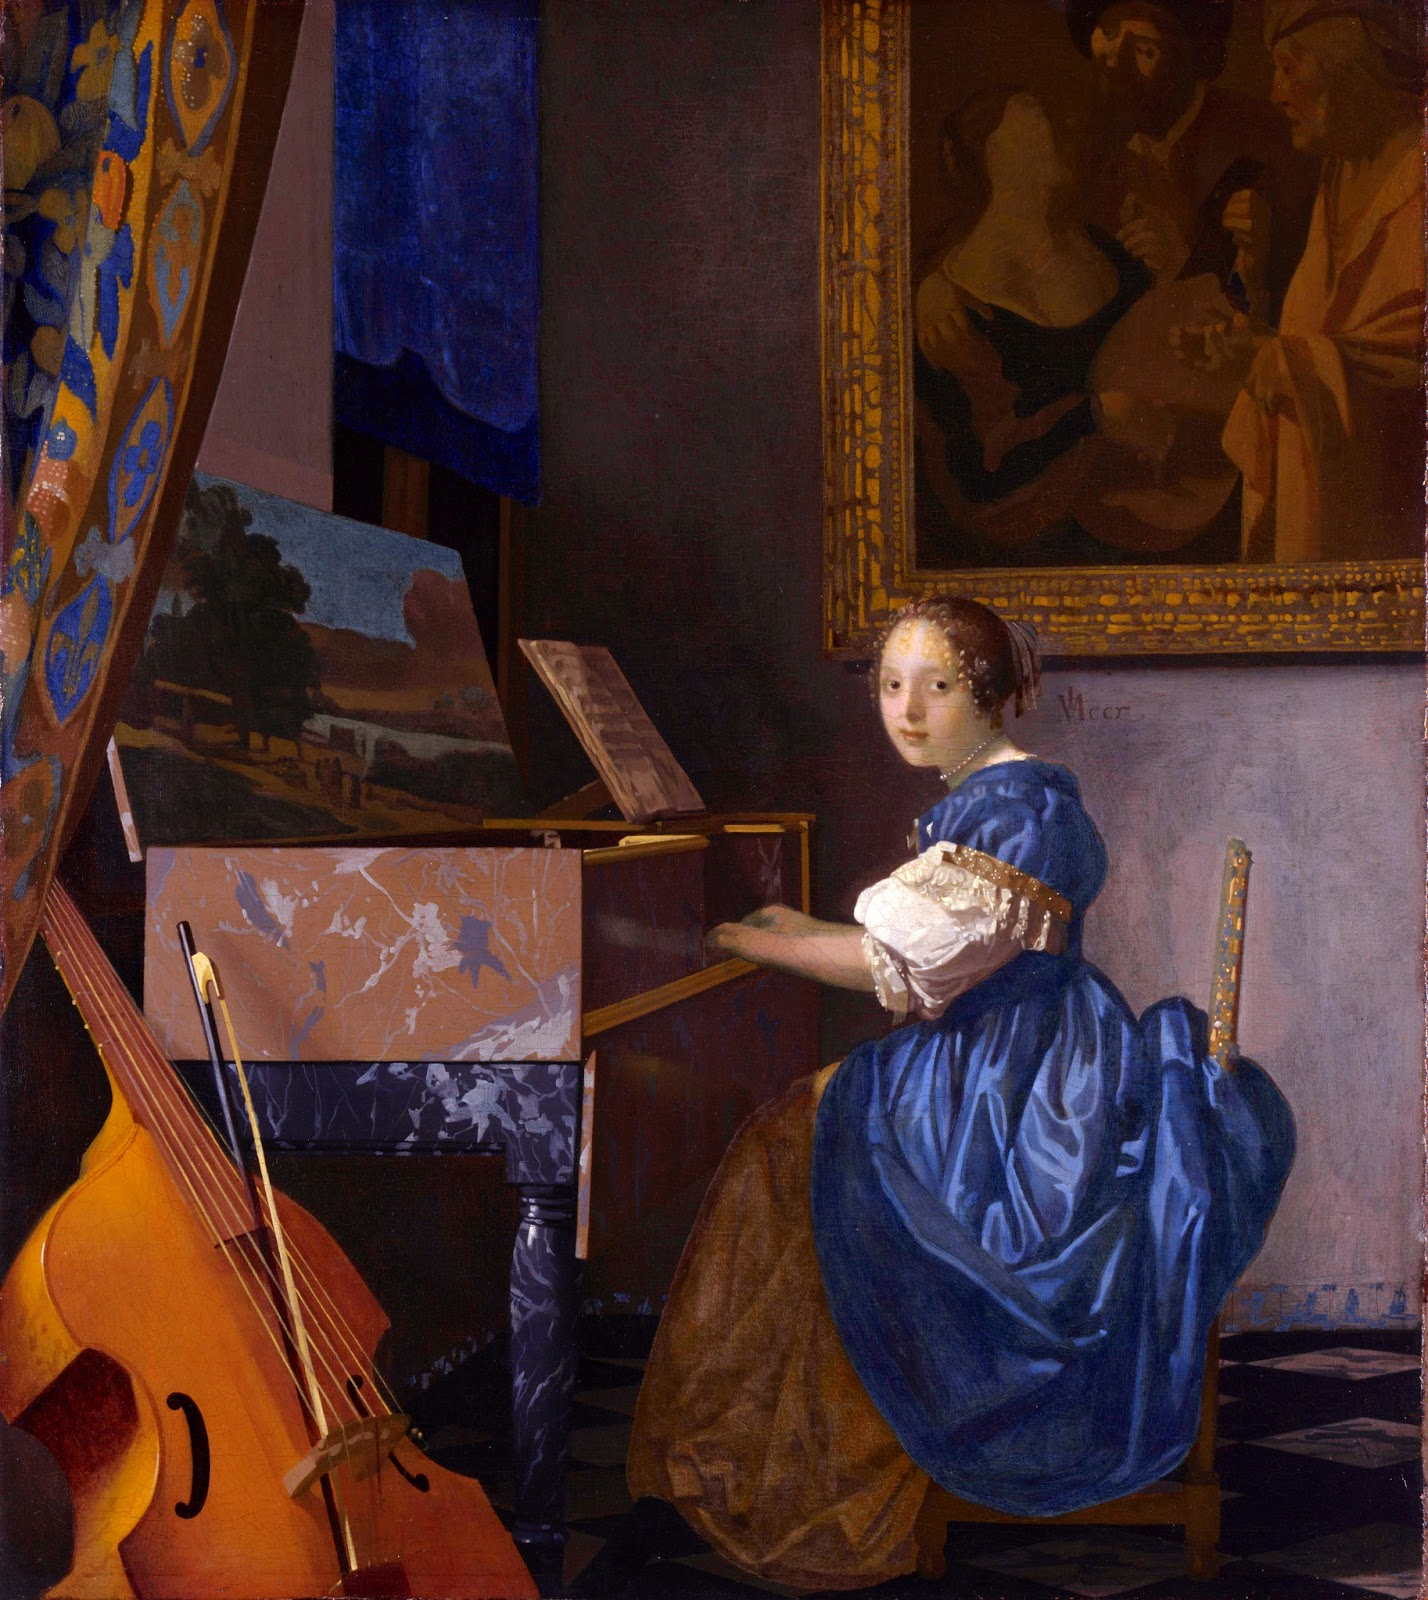 Mujer sentada tocando la espineta, h, 1675, óleo sobre lienzo, 51,5 x 45,5, National Gellery, Londres.